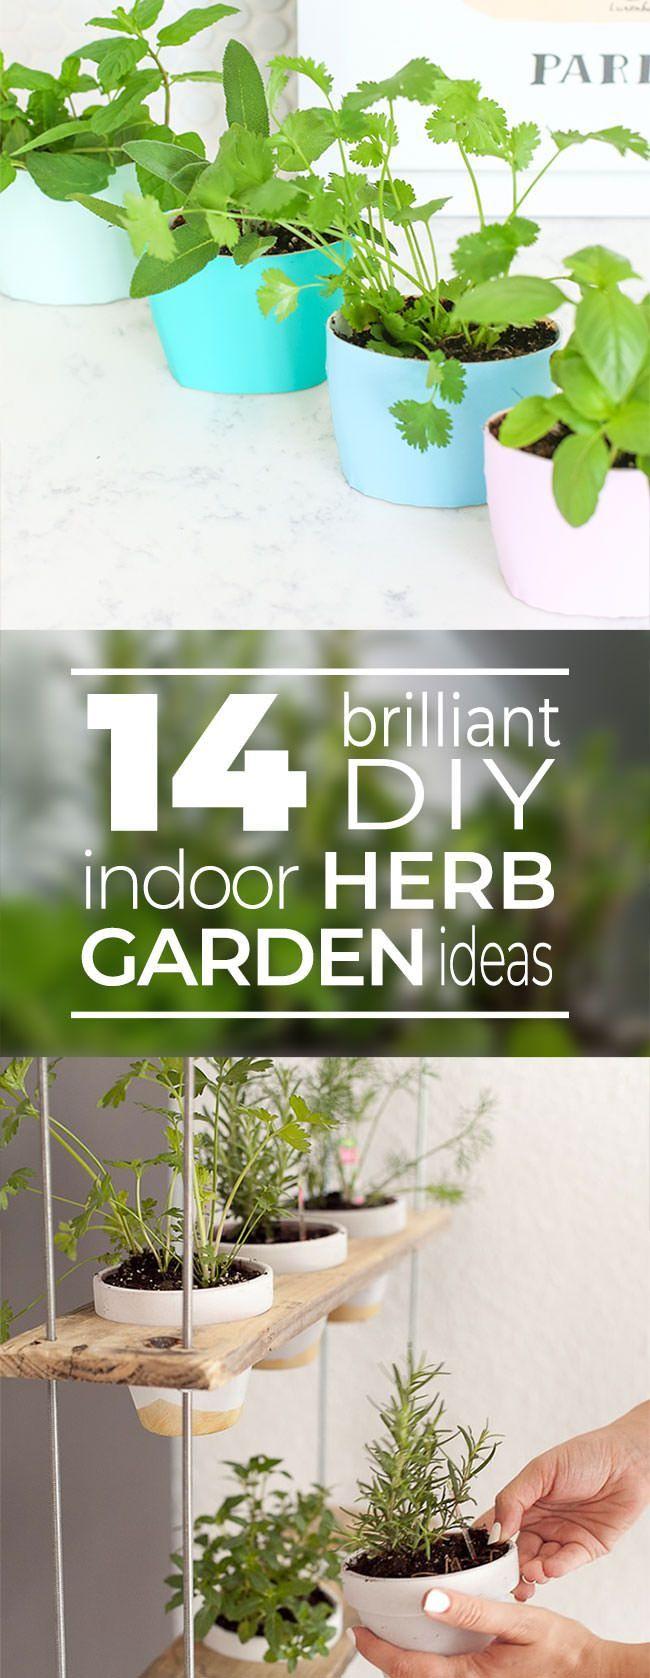 Photo of 14 Brilliant DIY Indoor Herb Garden Ideas